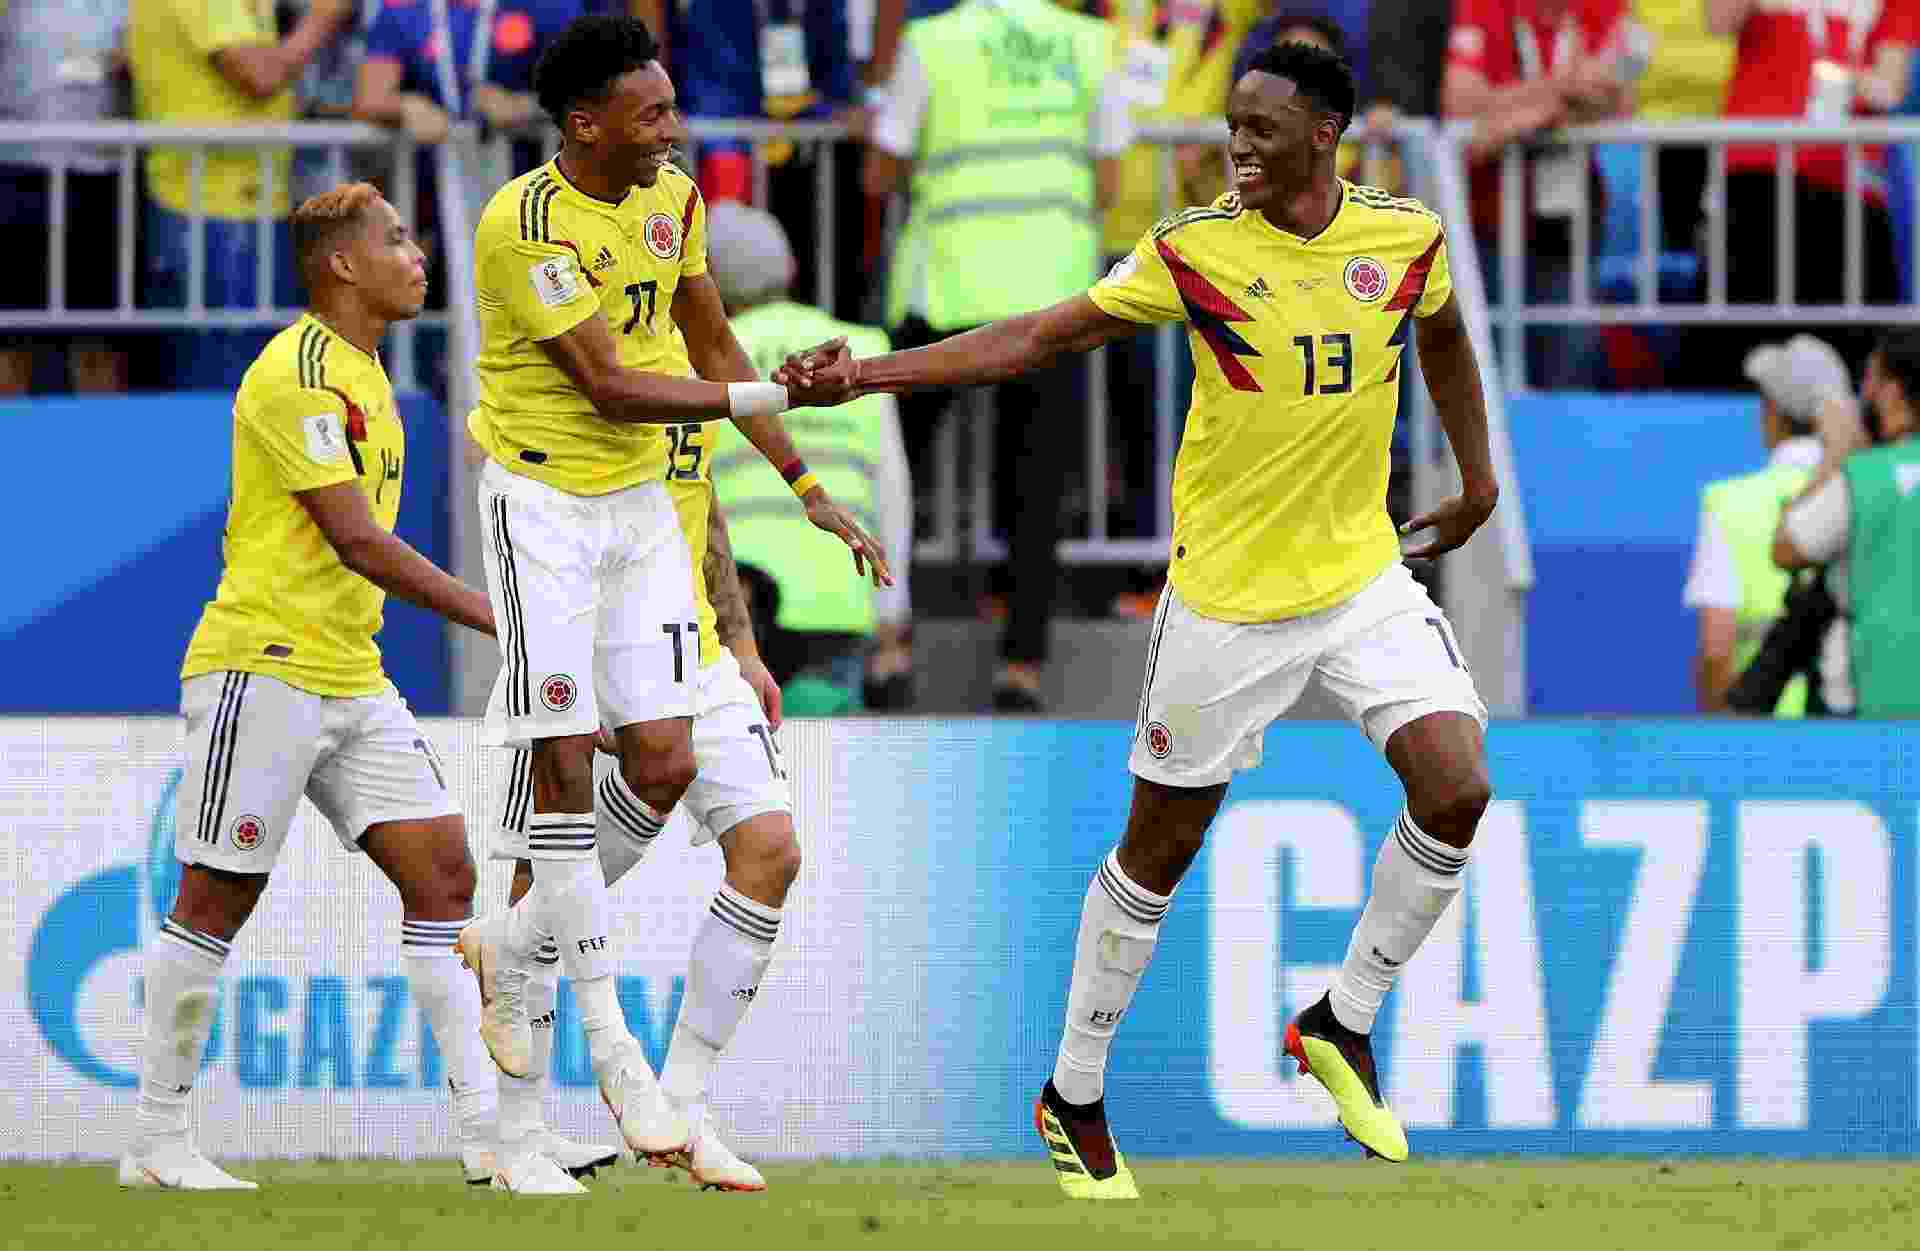 Mina (camisa 13) celebra o gol da Colômbia contra Senegal - Getty Images